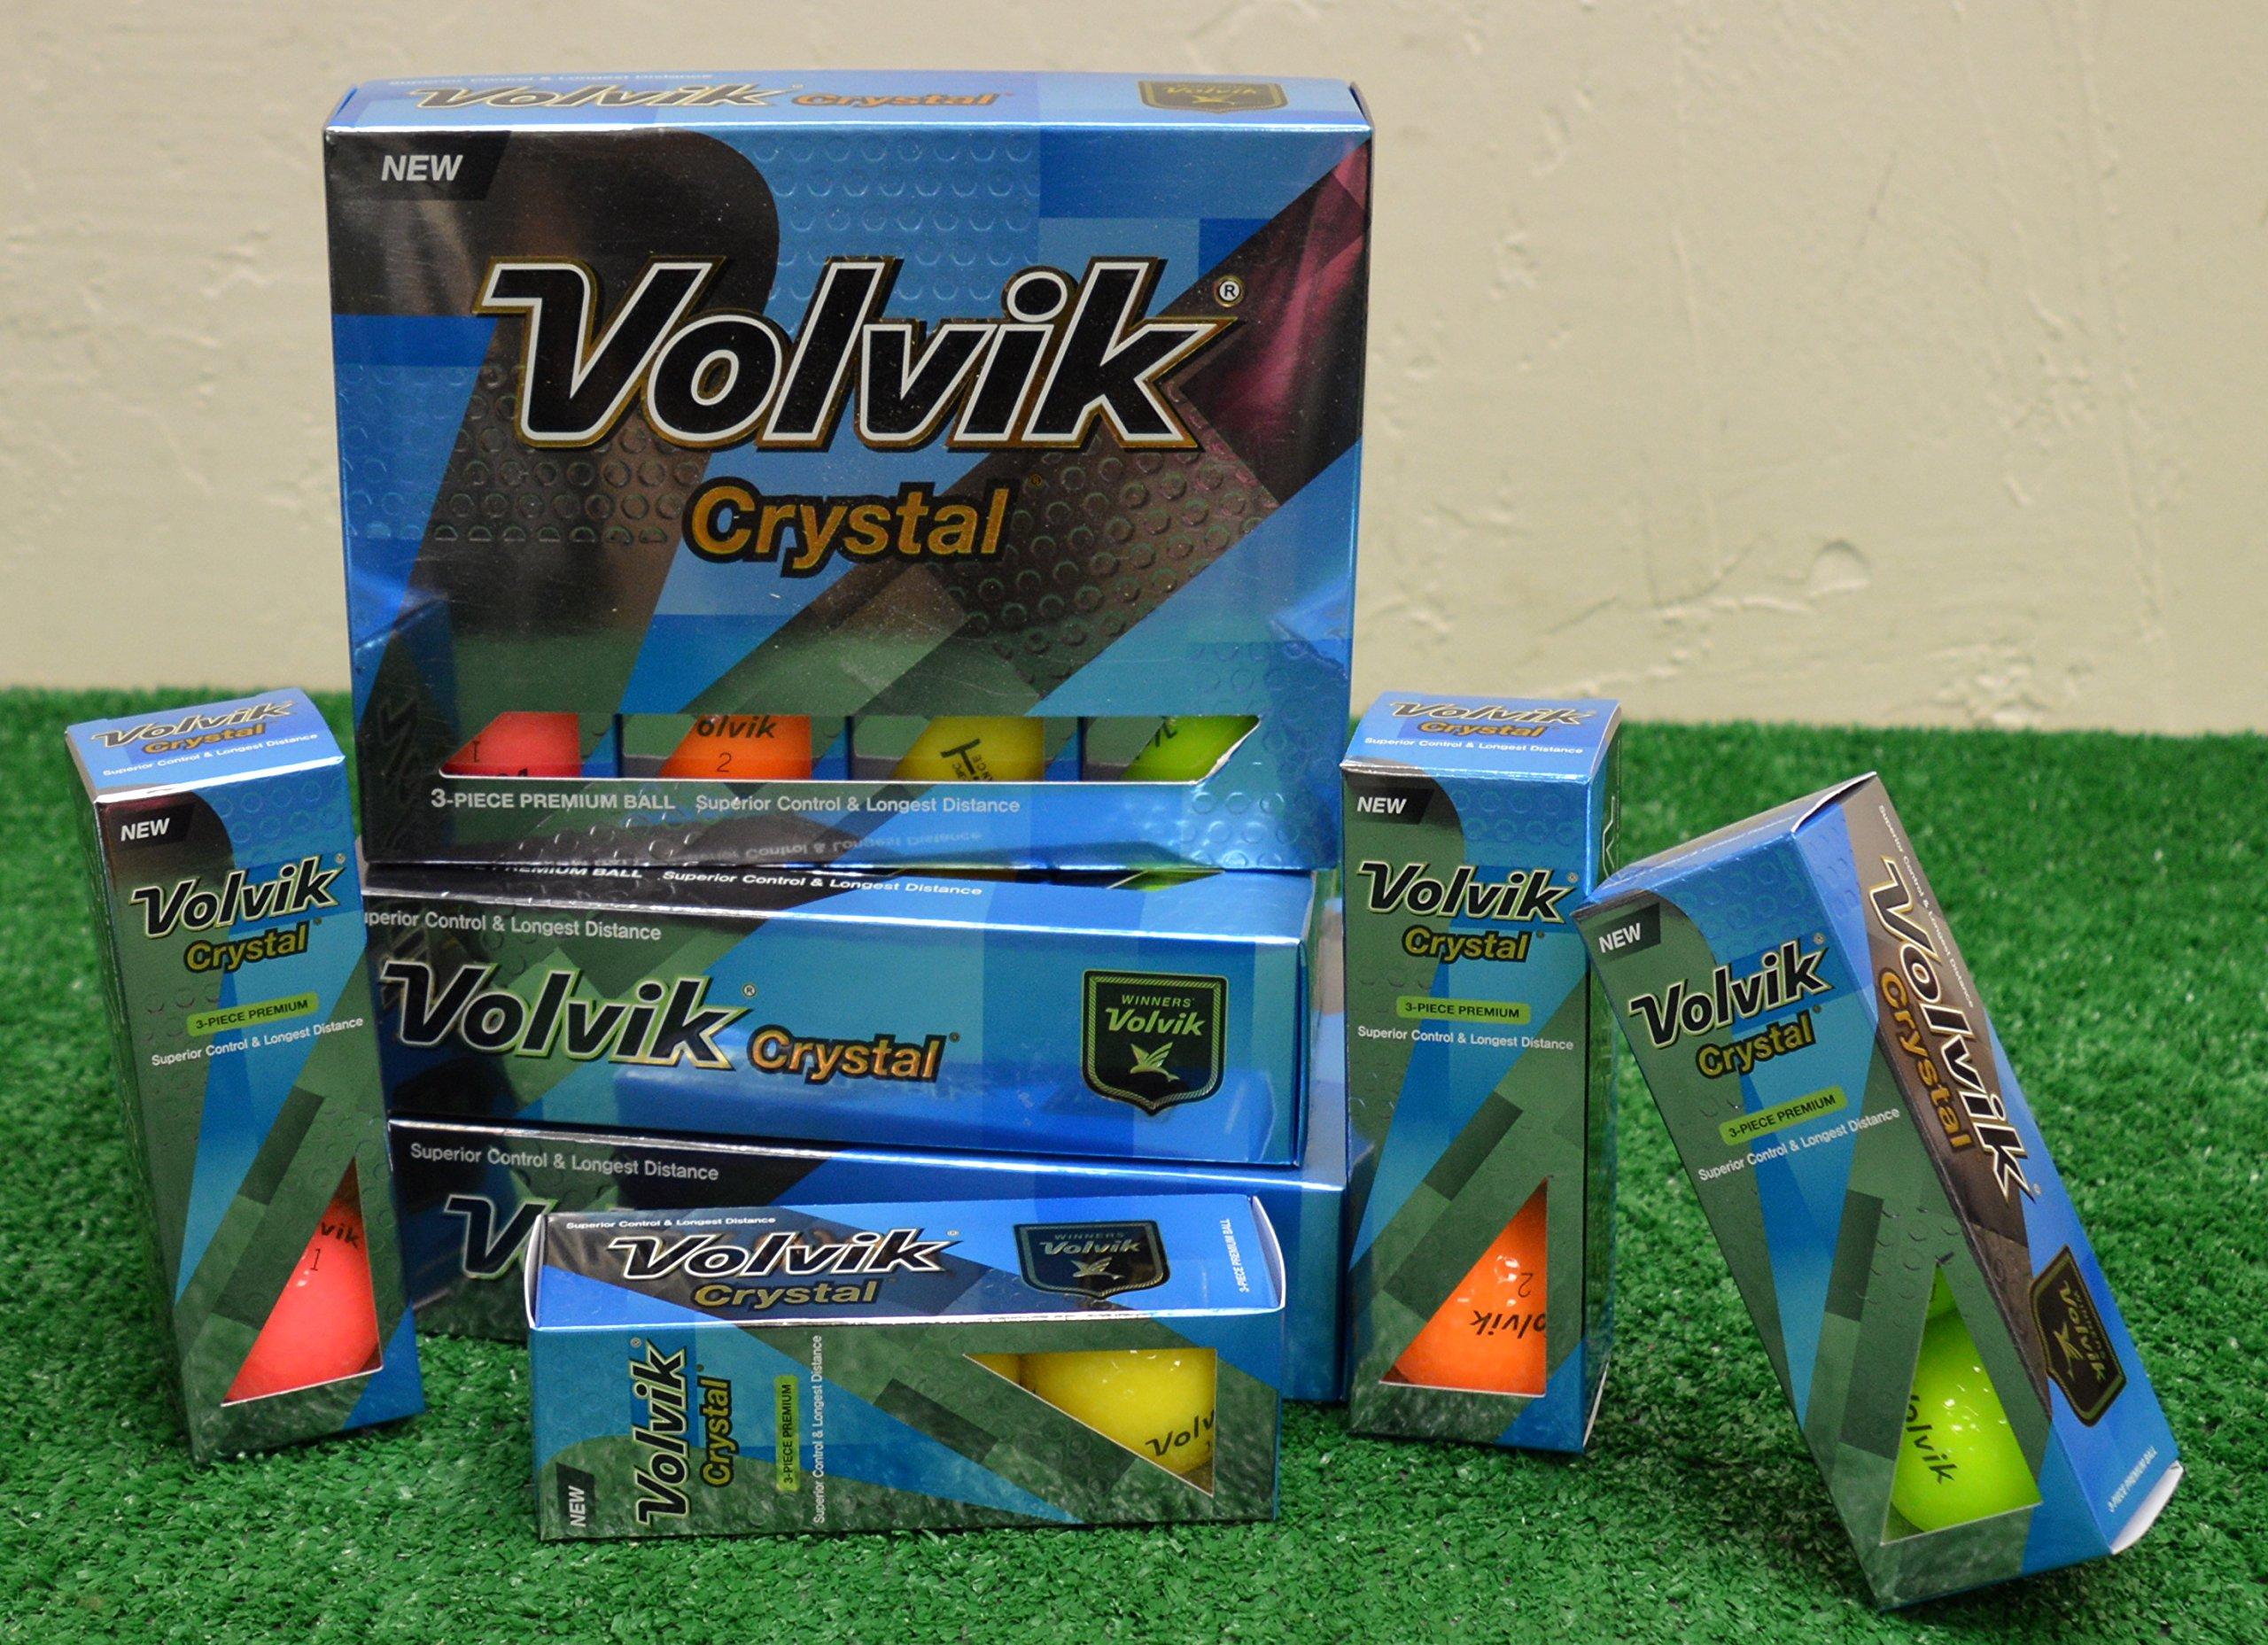 4 Dozen Volvik Crystal Mixed Color Golf Balls - New in Box